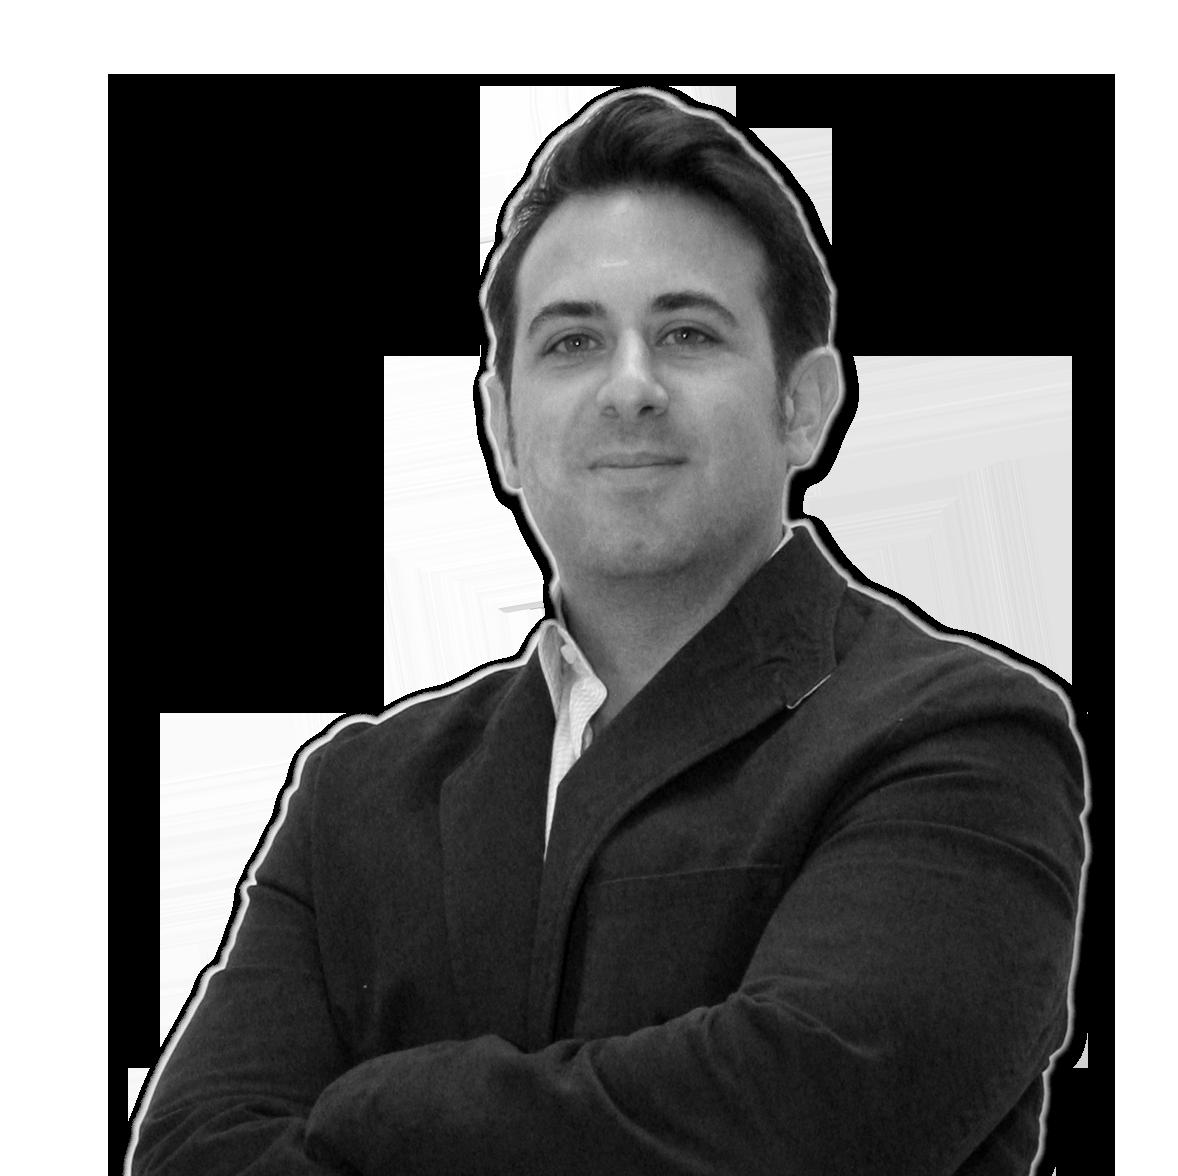 Juan Feal